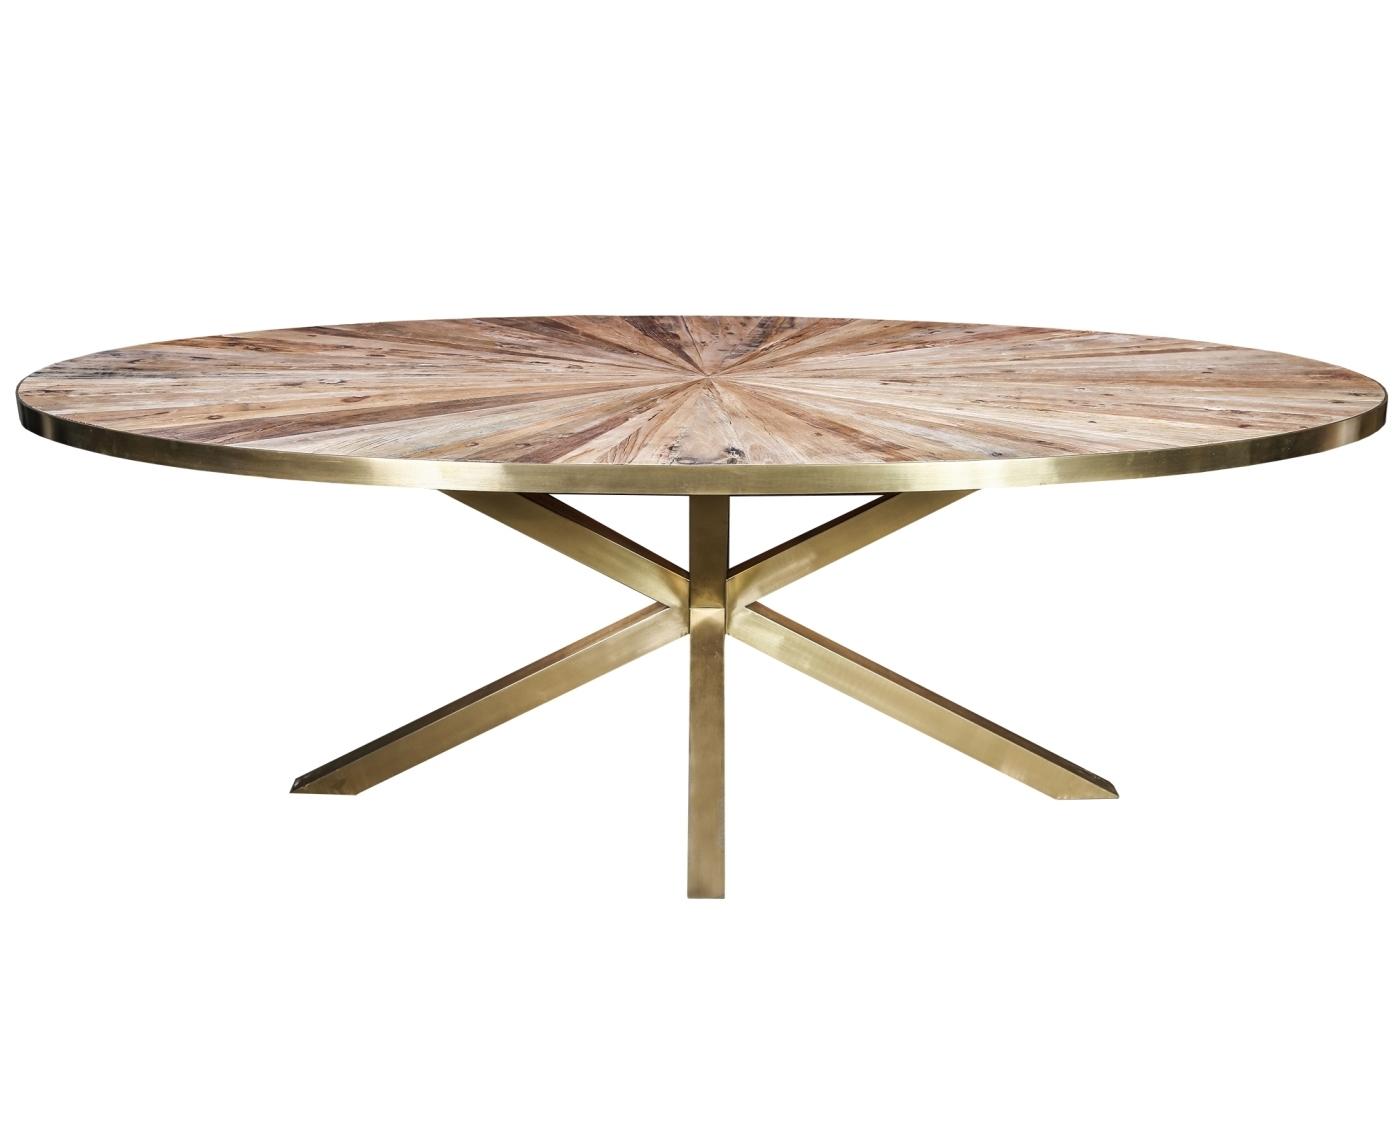 Cleme ovale Elm wood diningtable gold steel base PTMD